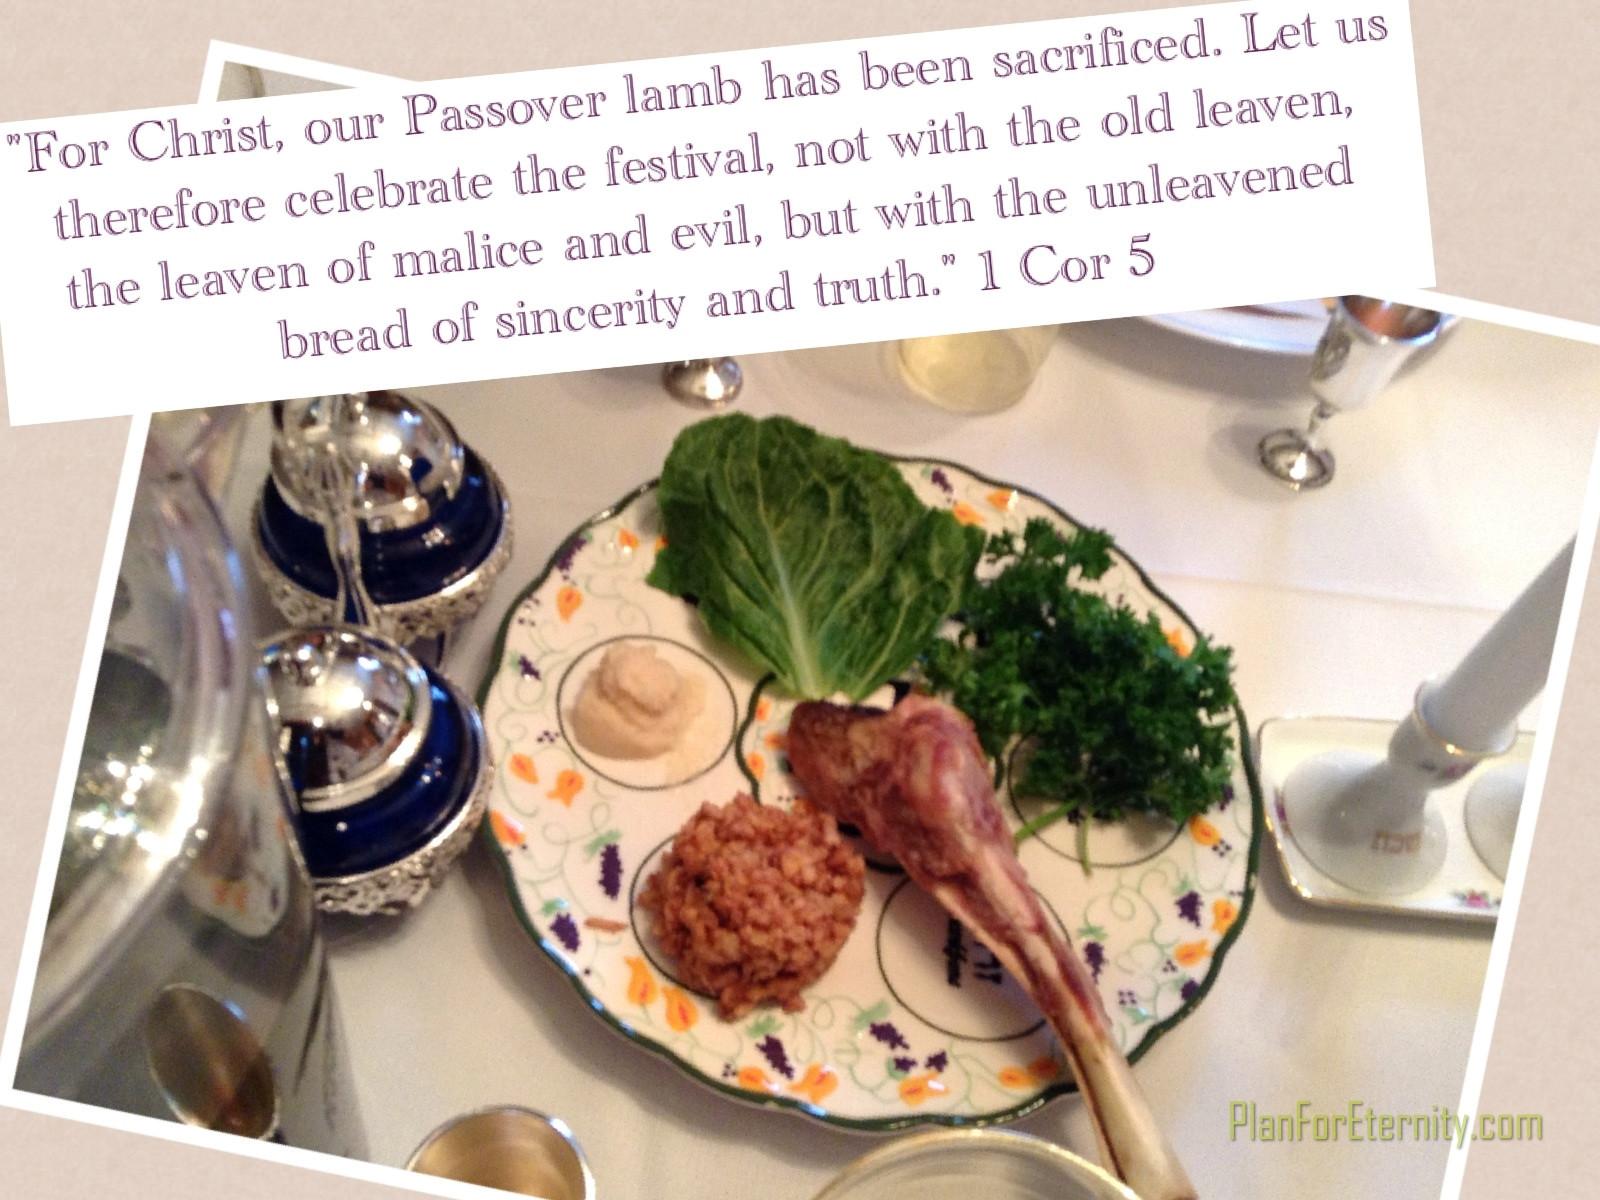 Jesus in Passover